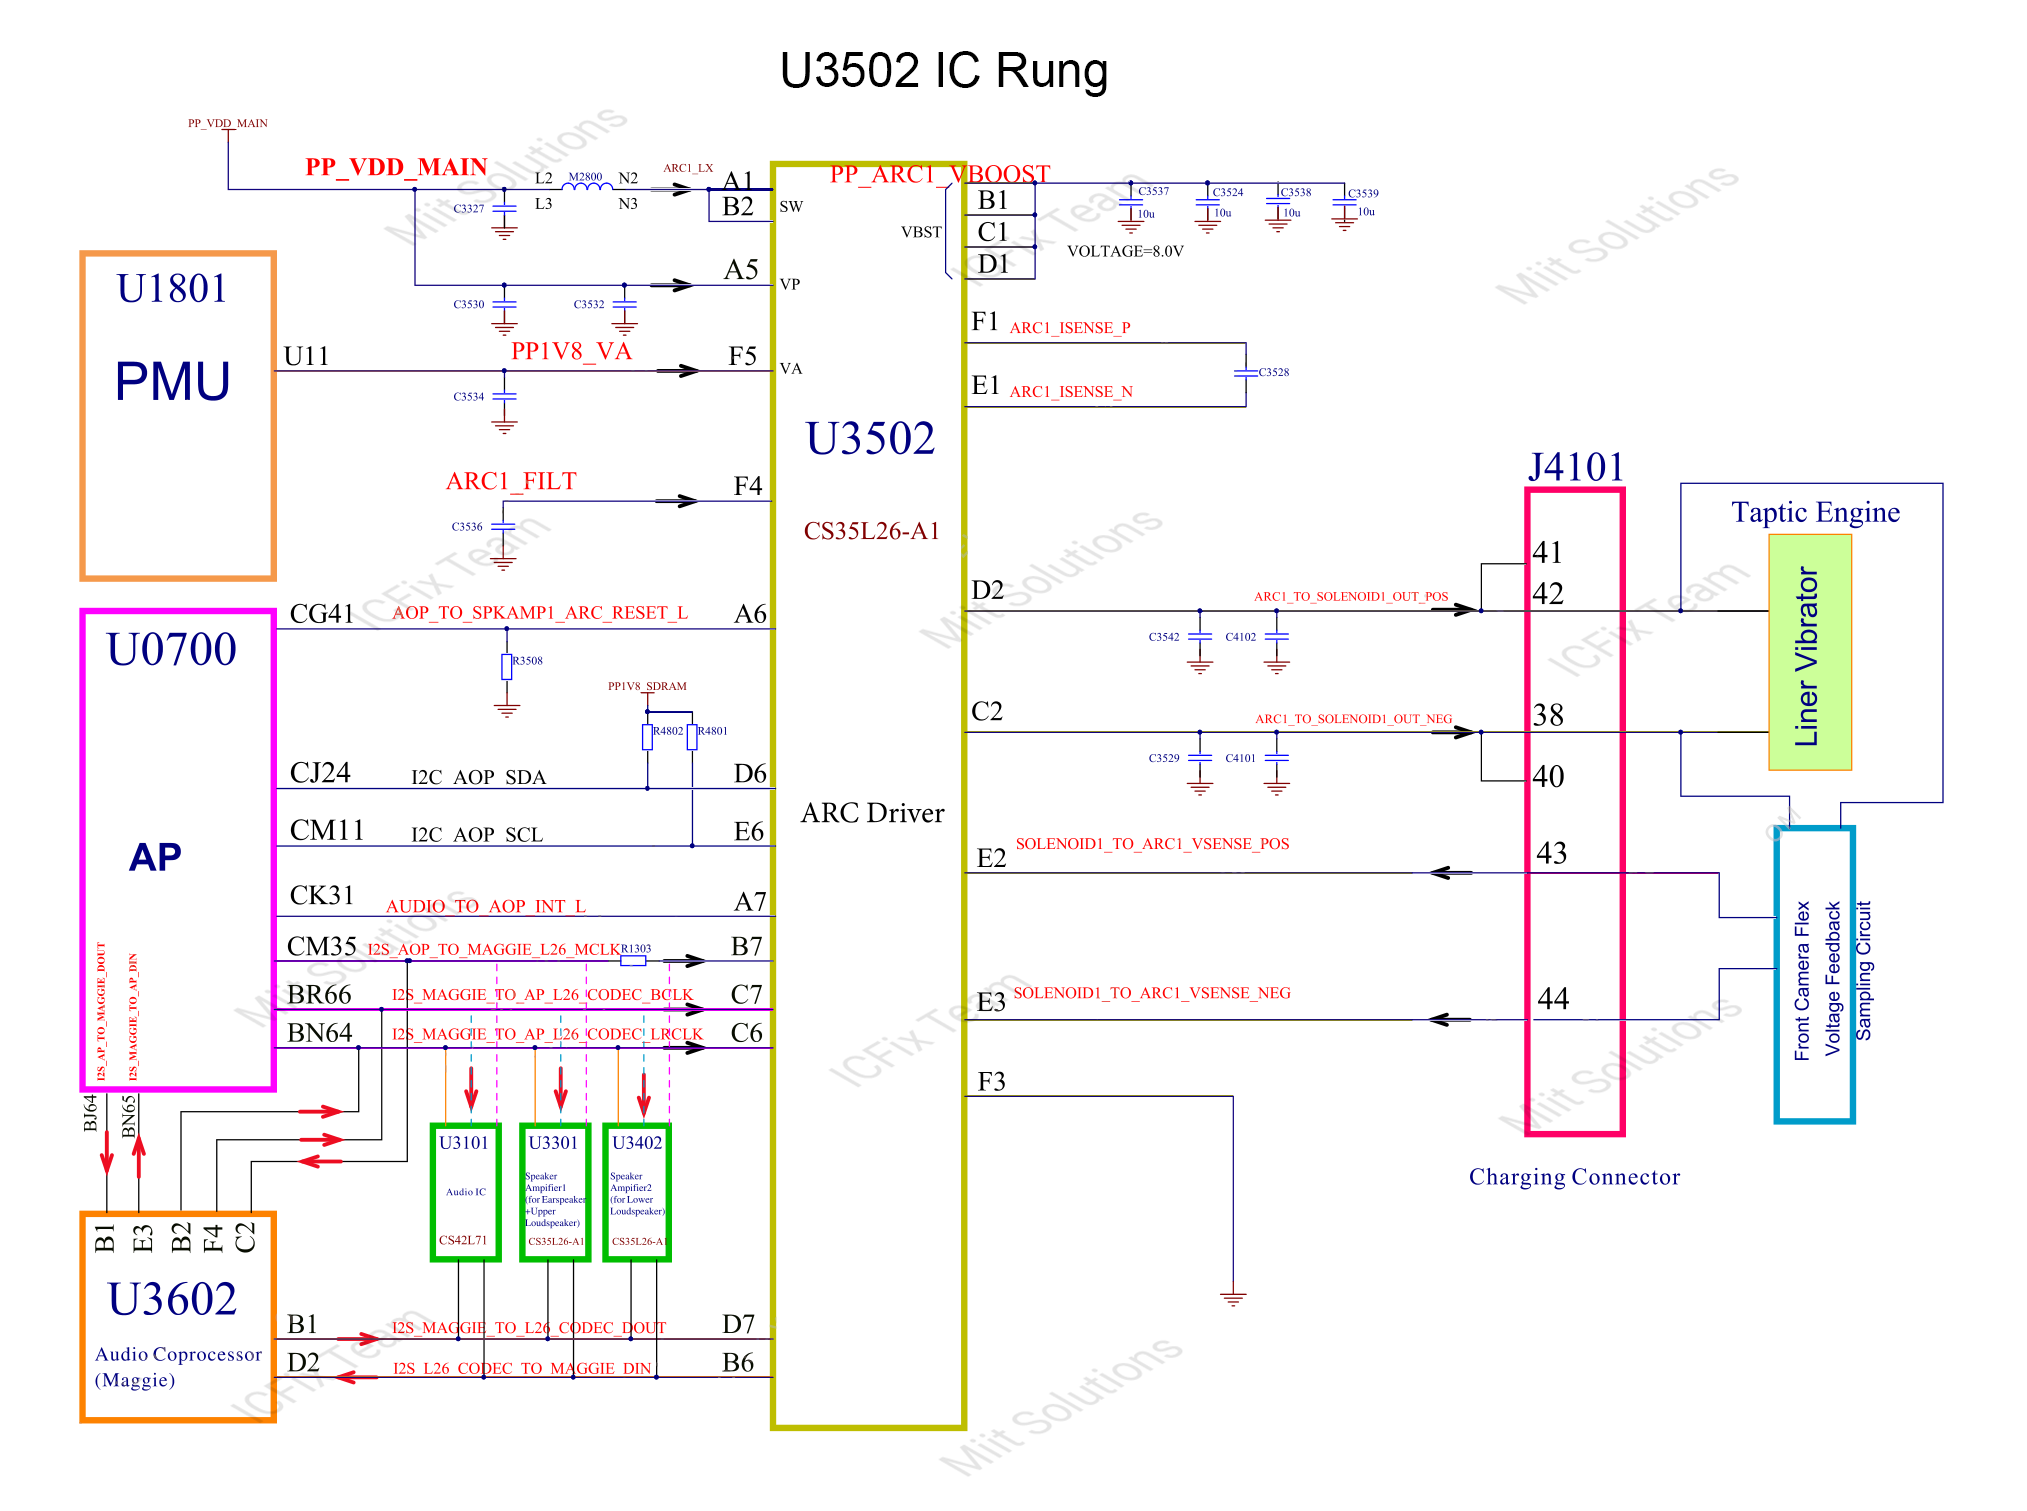 U3502 IC quản lý rung taptic engine iPhone 7